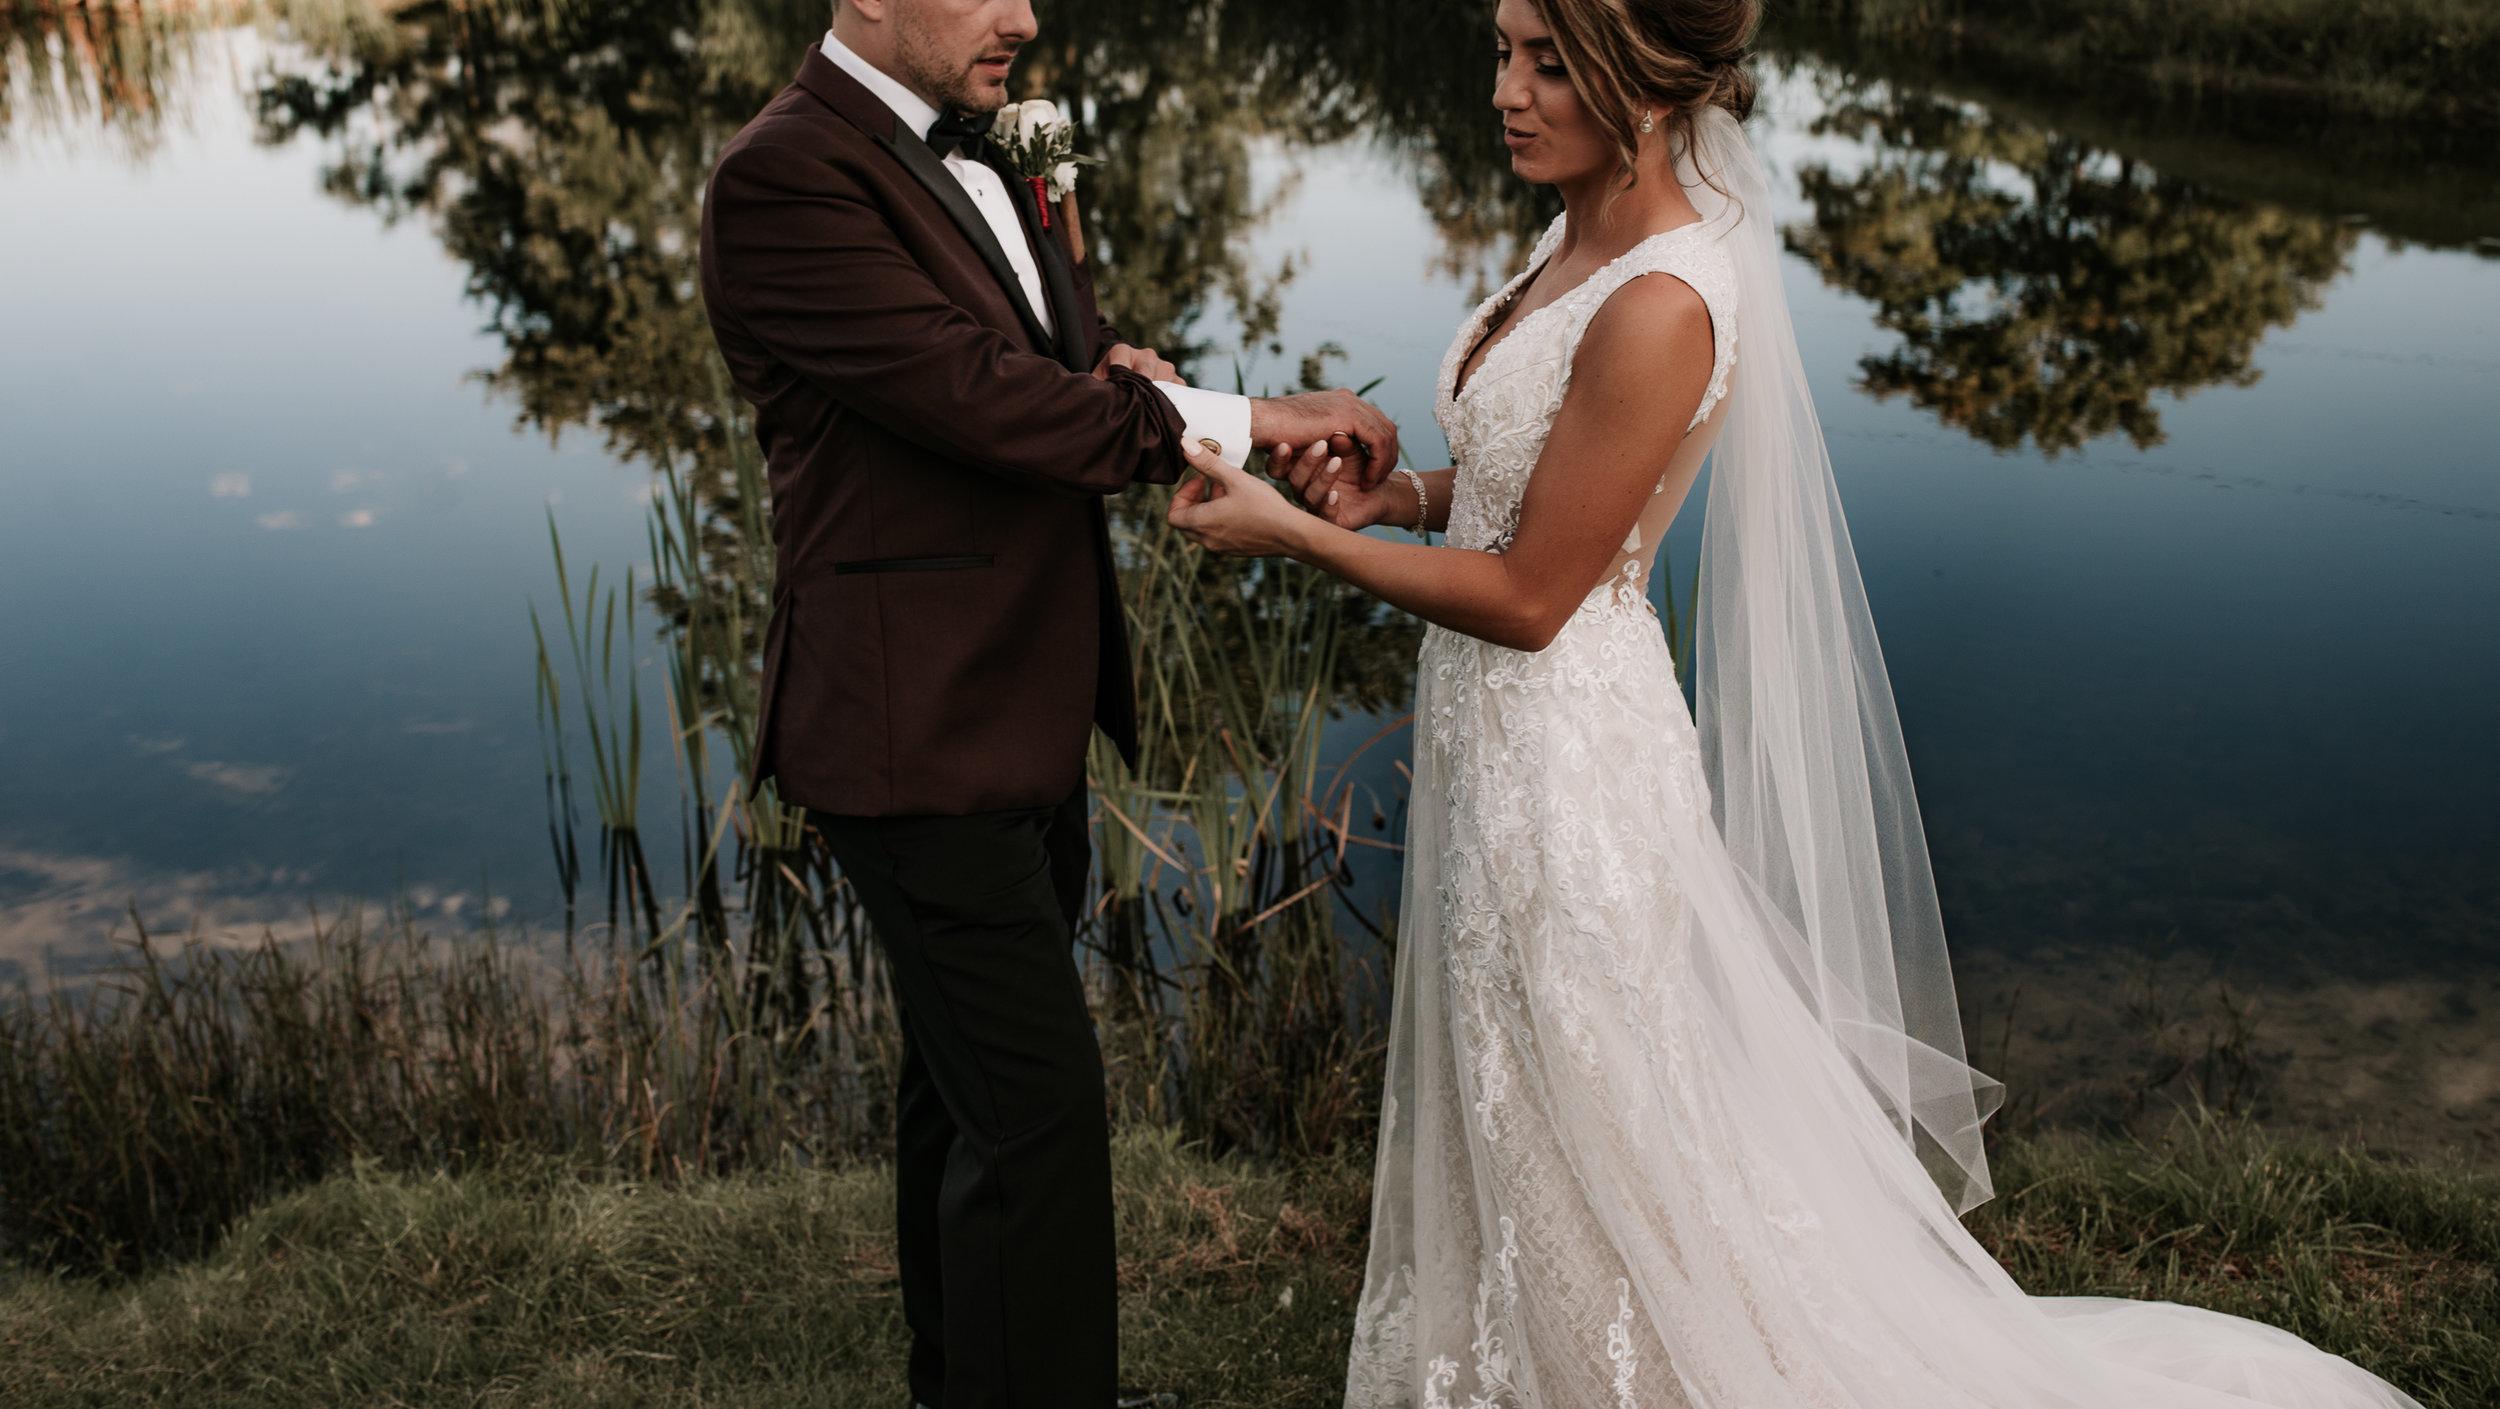 Claremont_fourseasons_Wedding-359.jpg